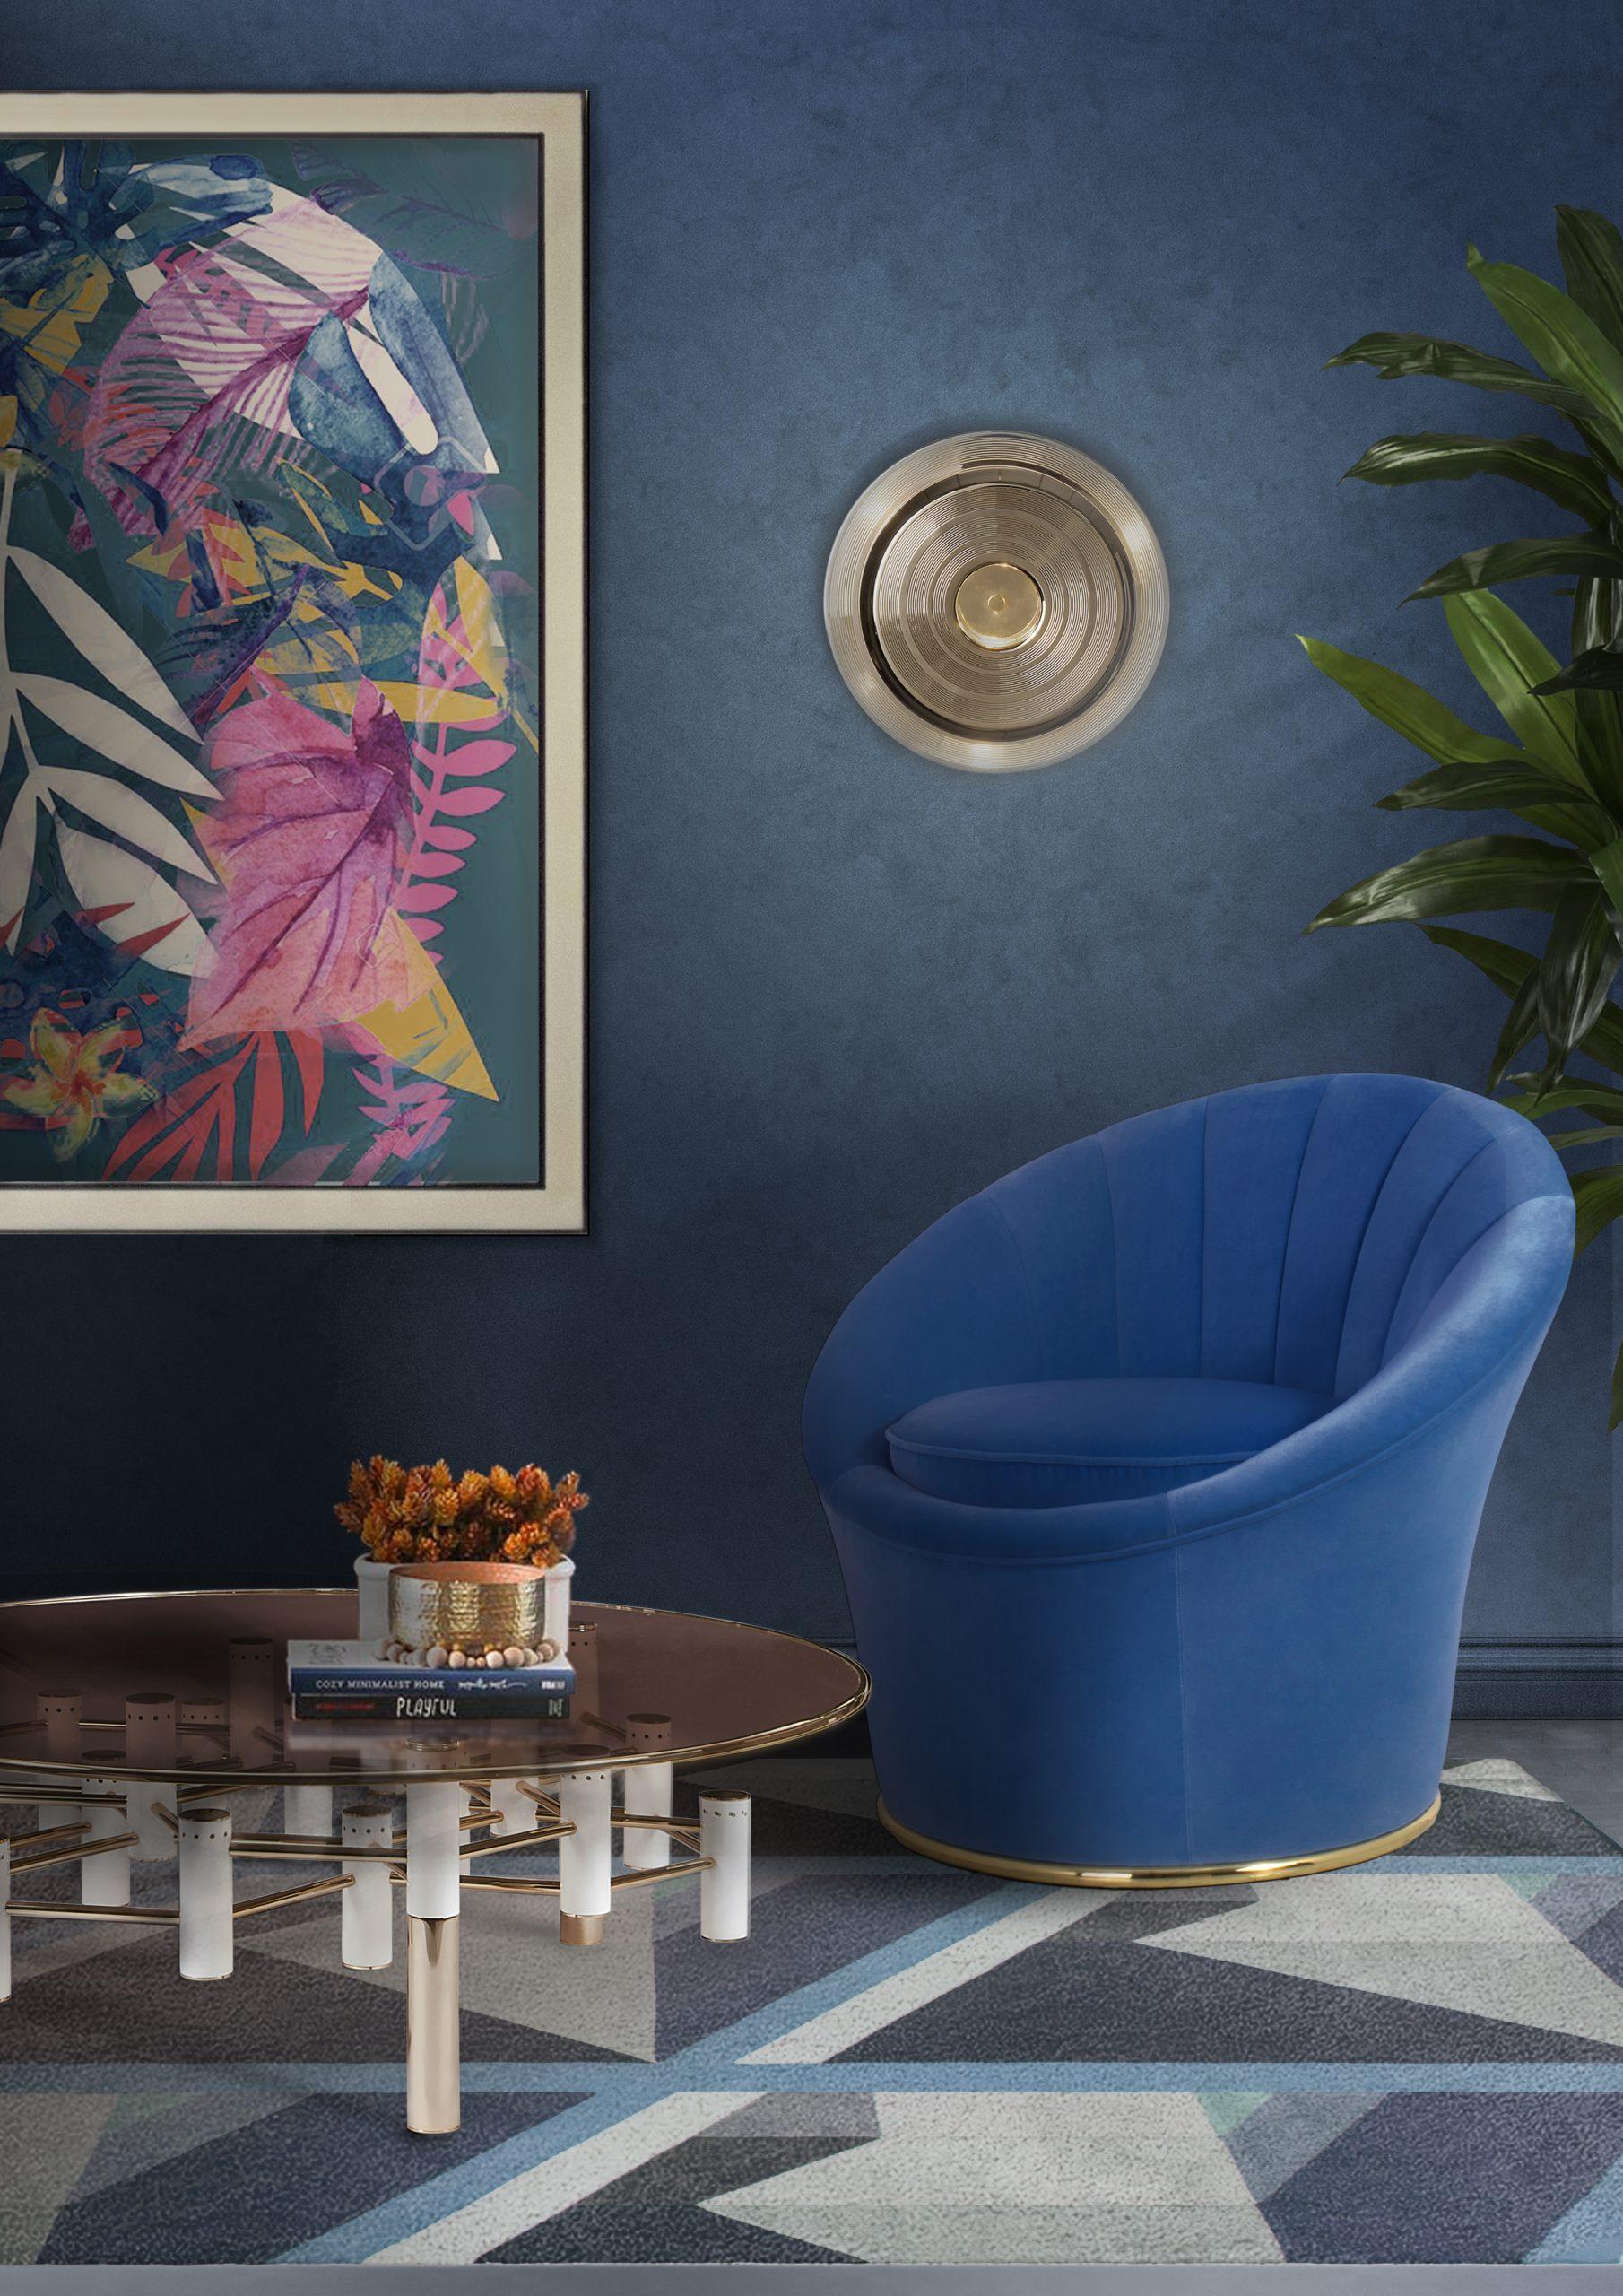 2021 Dubai Home Trends That Will Transform Your Home Into a Crown Jewel of Design! dubai home trends 2021 Dubai Home Trends That Will Transform Your Home Into a Crown Jewel of Design! 10 scaled